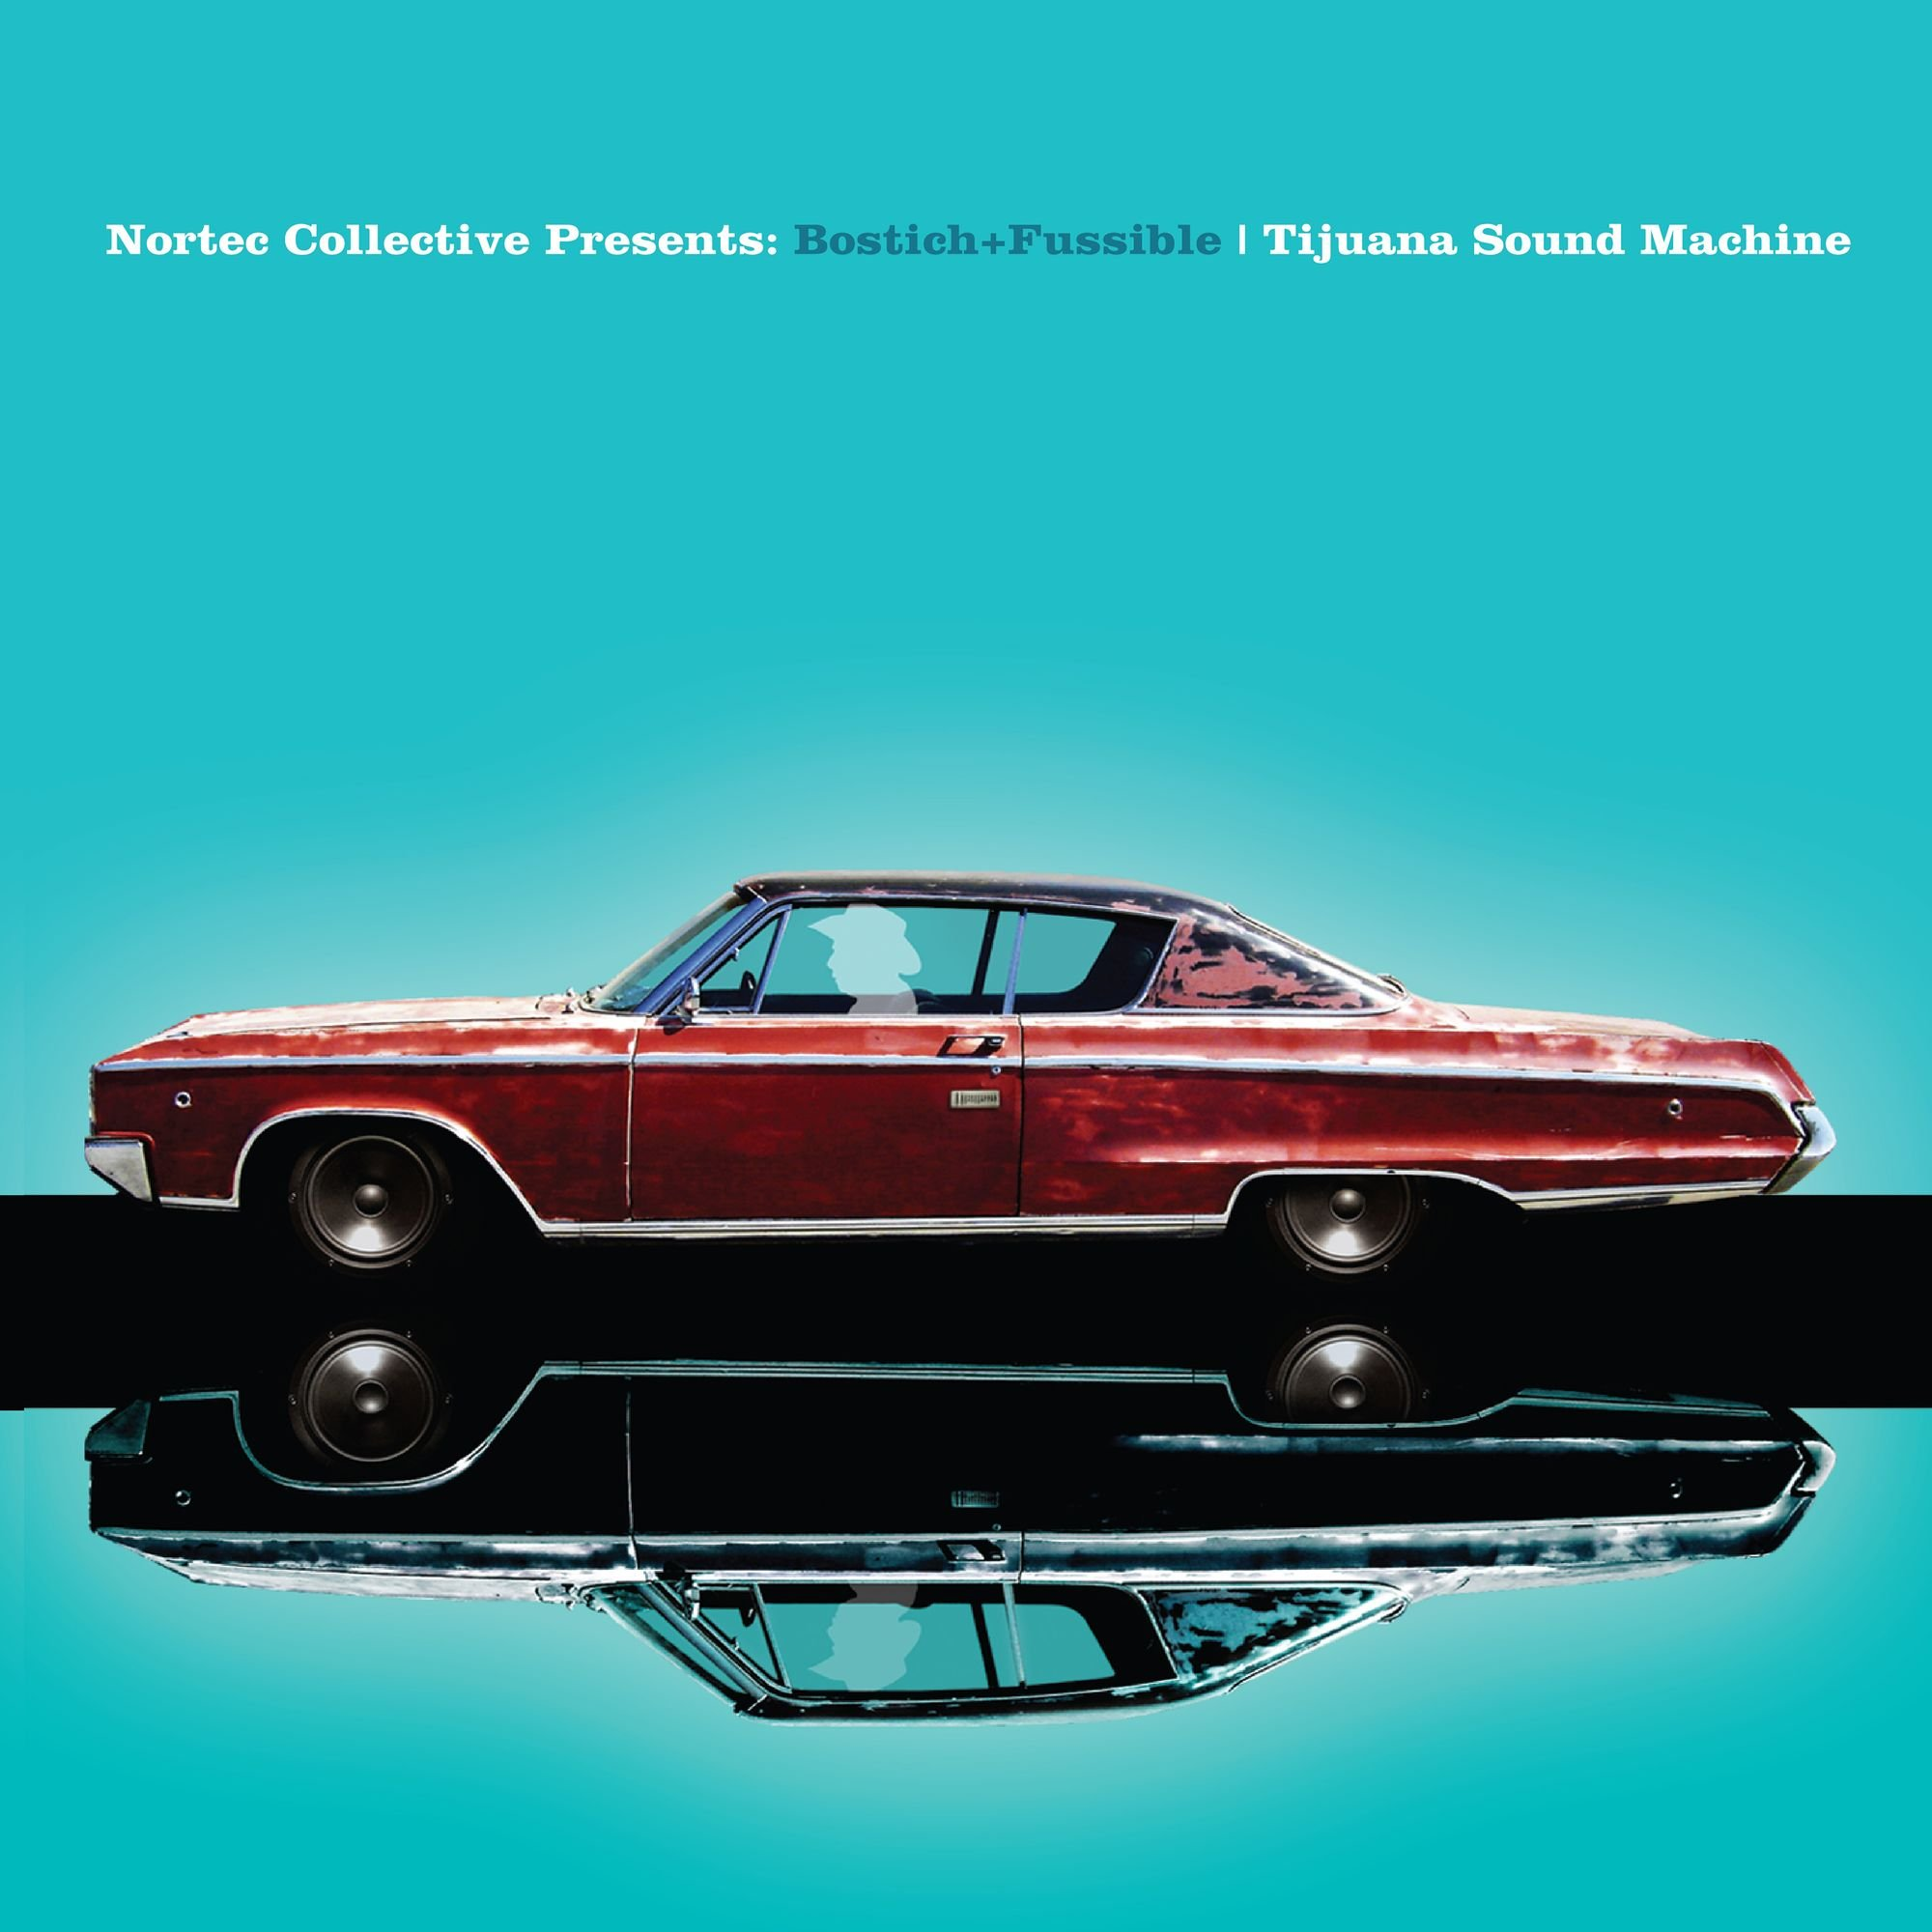 Tijuana Sound Machine (Nortec Collective Presents) by Nacional Records